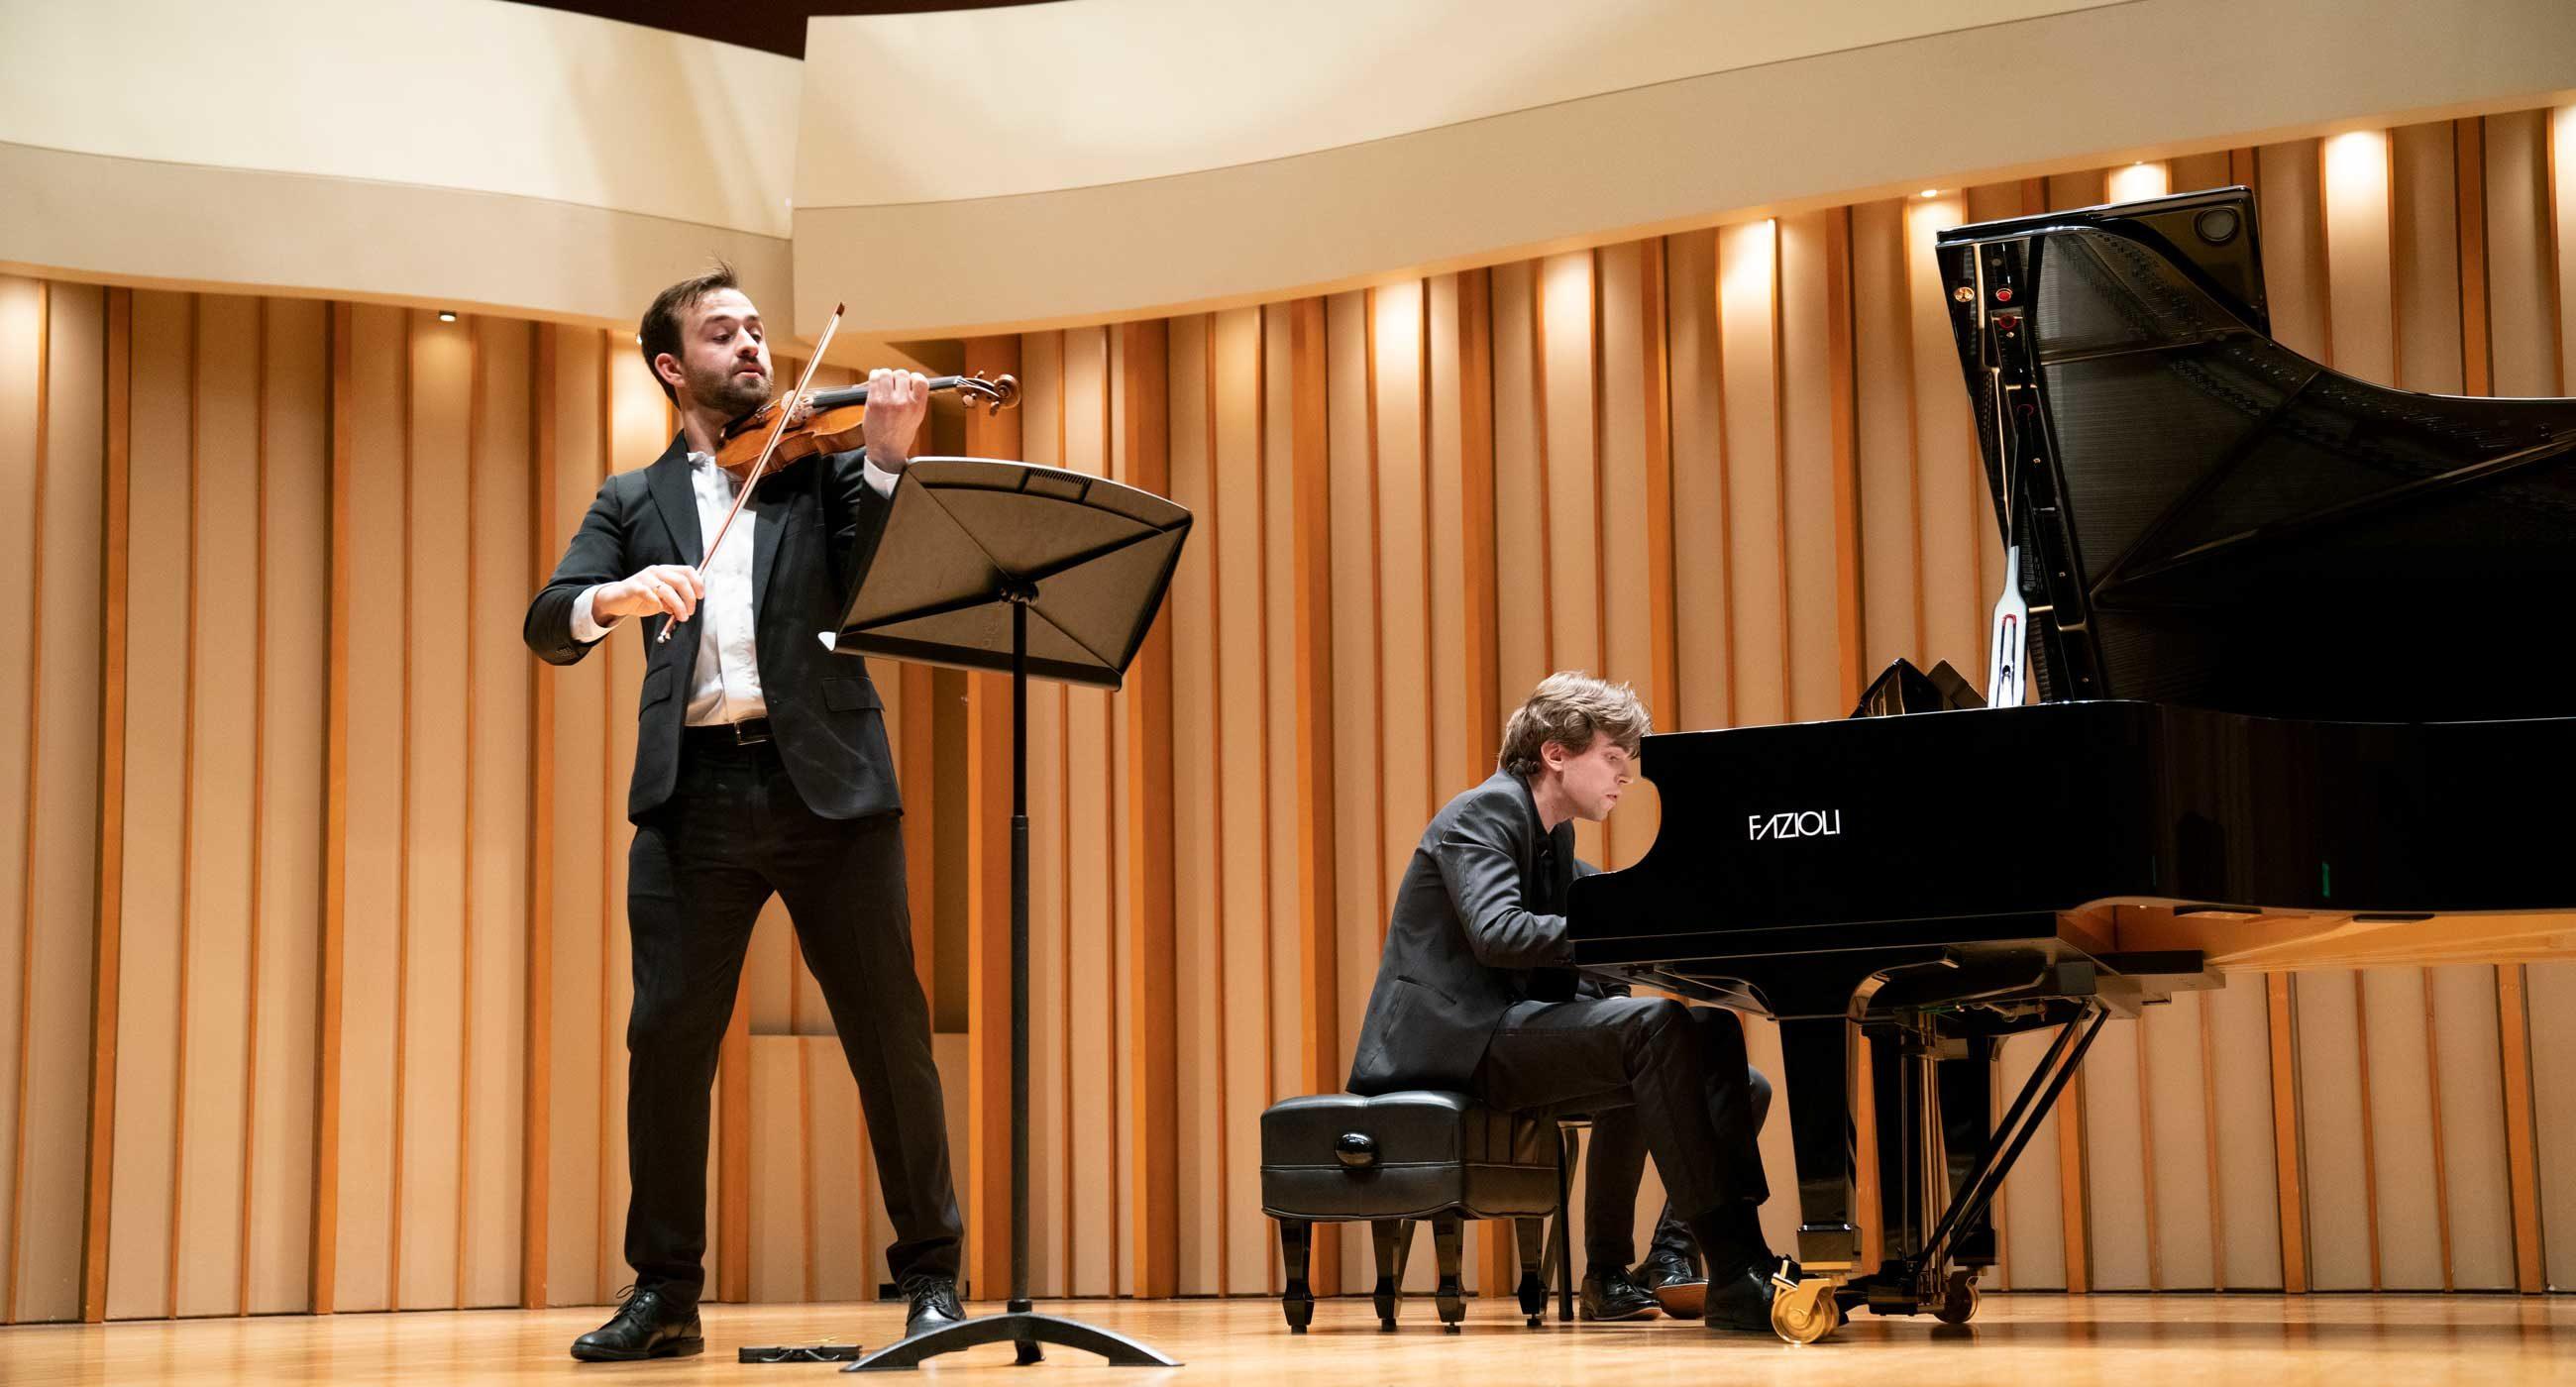 William Hagen and Albert Cano Smit perform